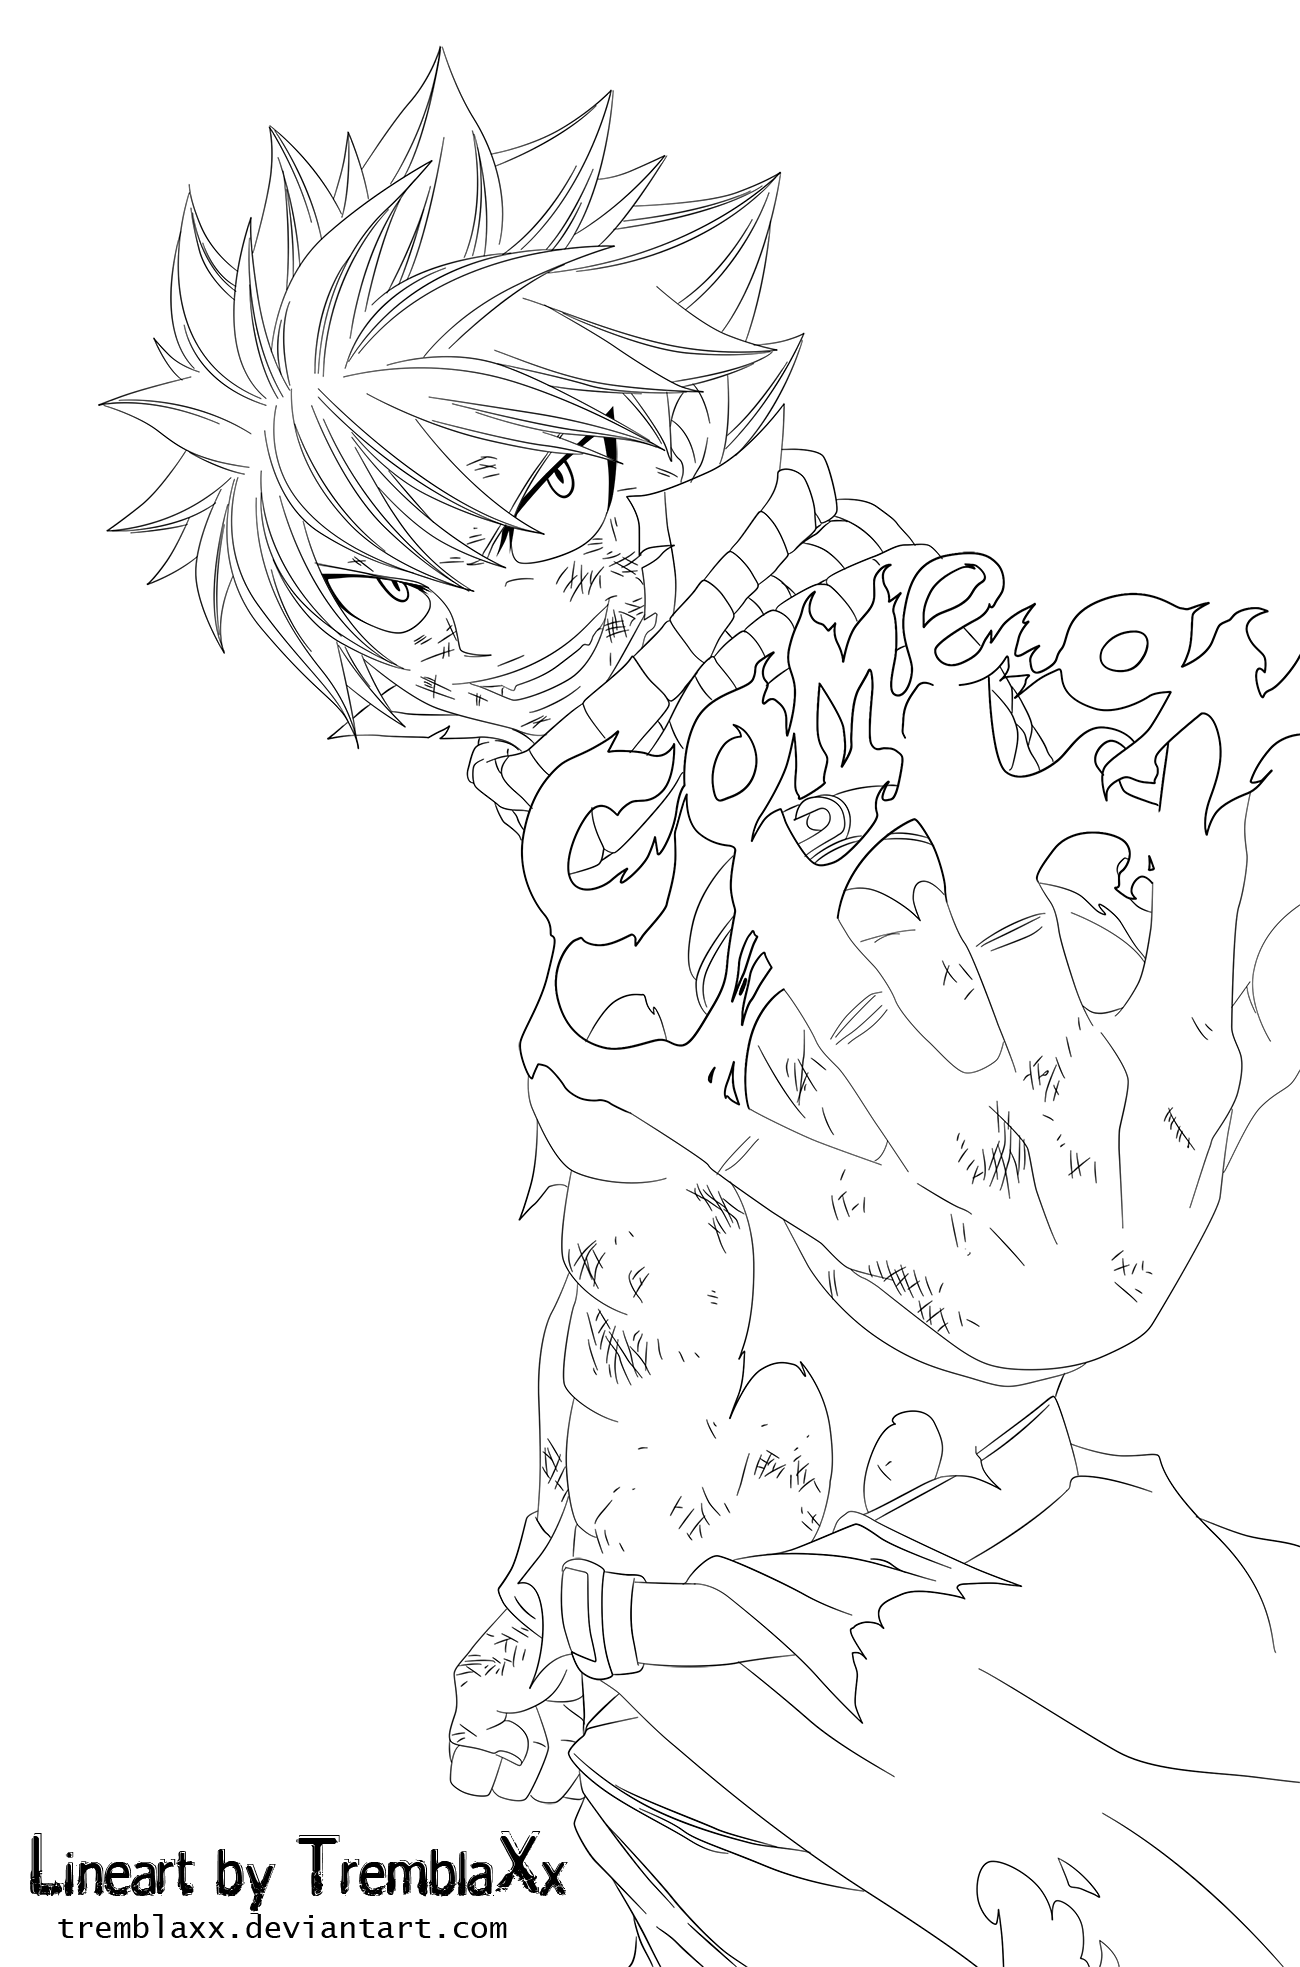 Natsu Lineart : Natsu come on lineart by ramzykamen deviantart